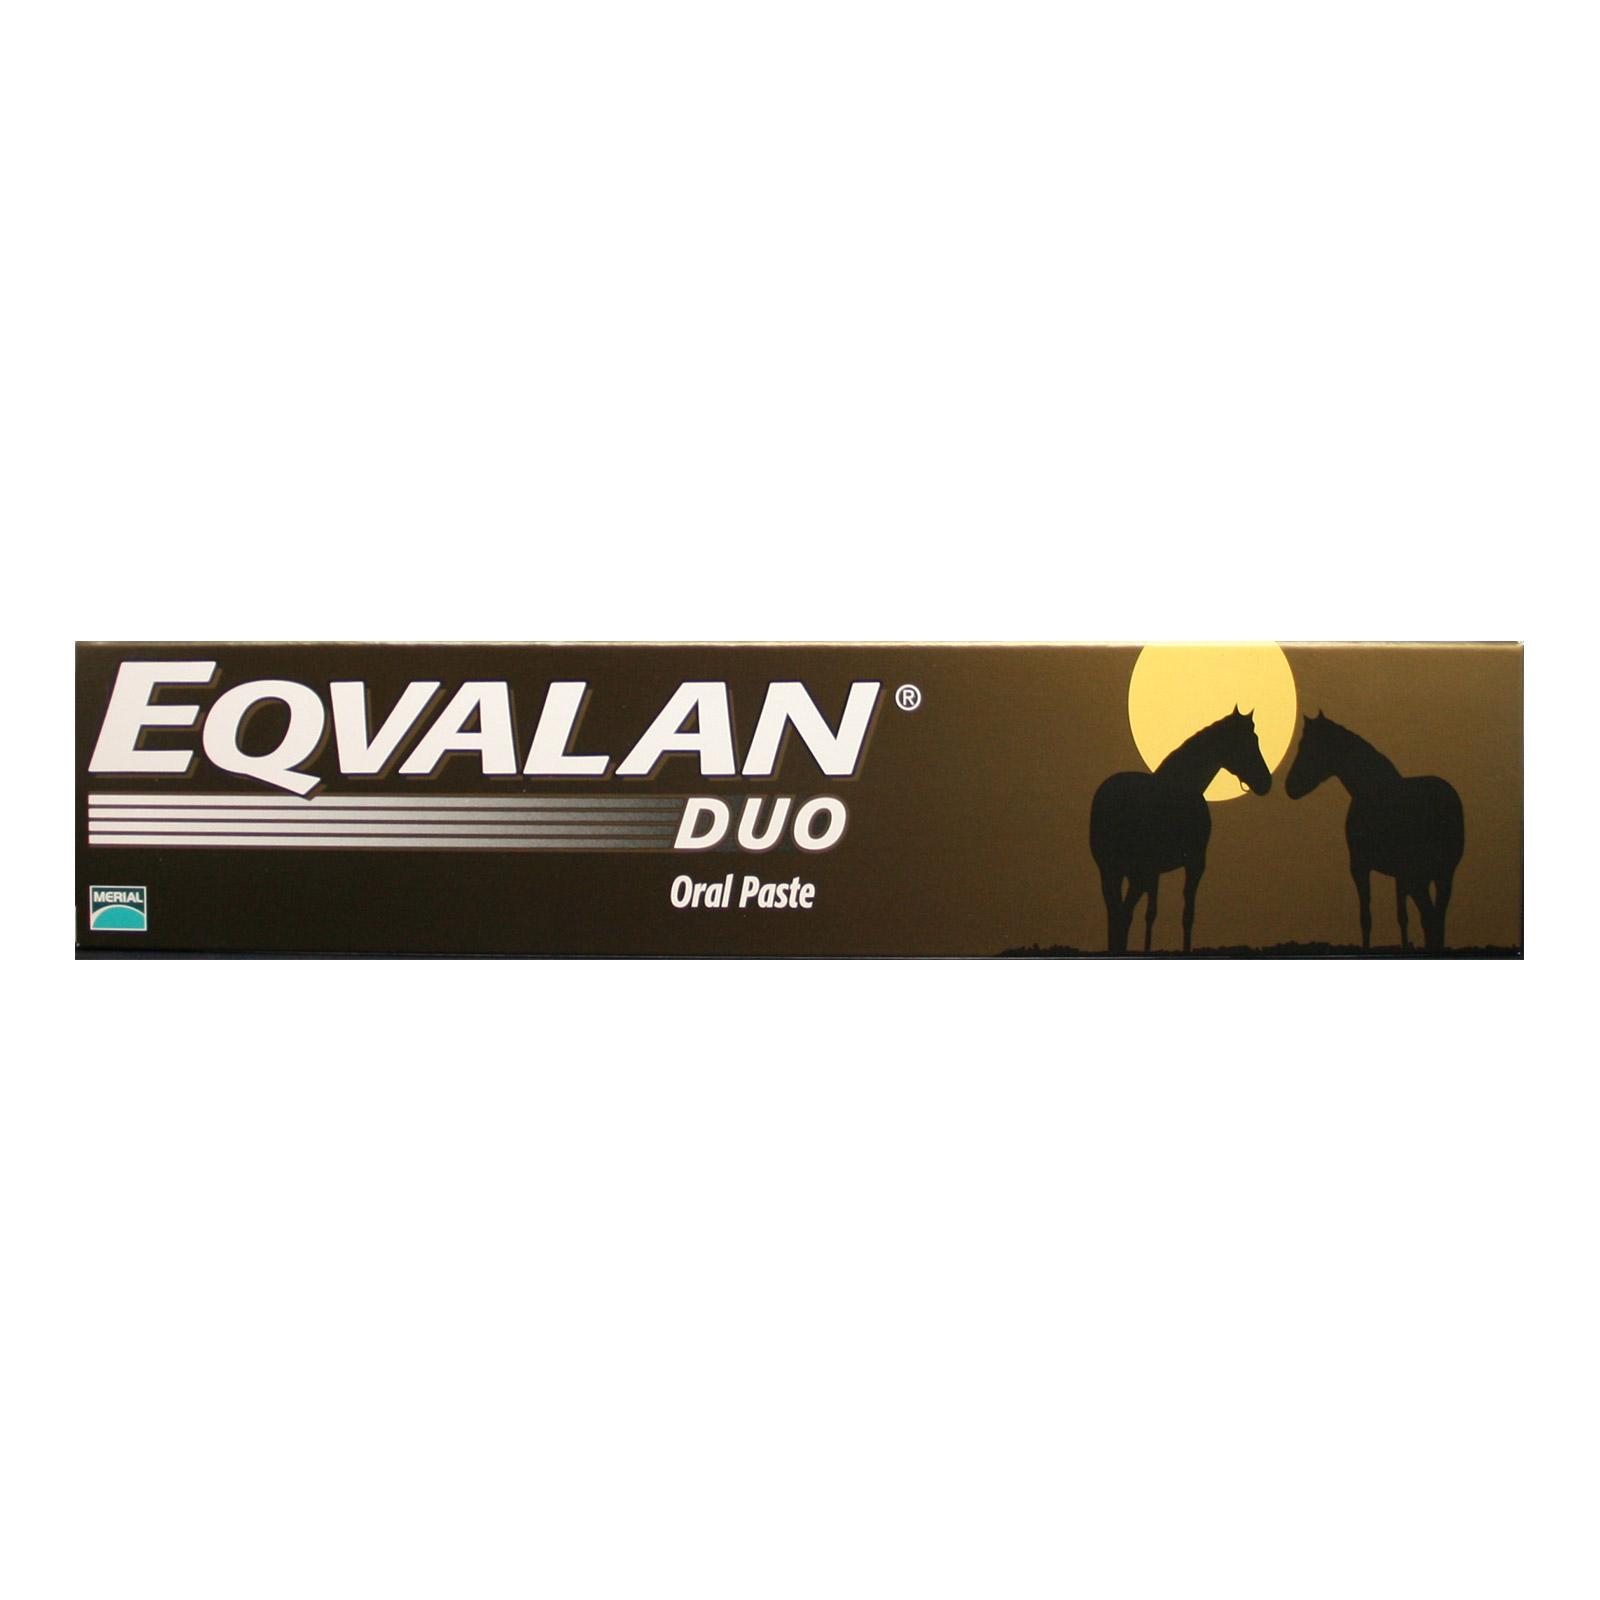 Eqvalan Duo 7.74gm 1 Syringe